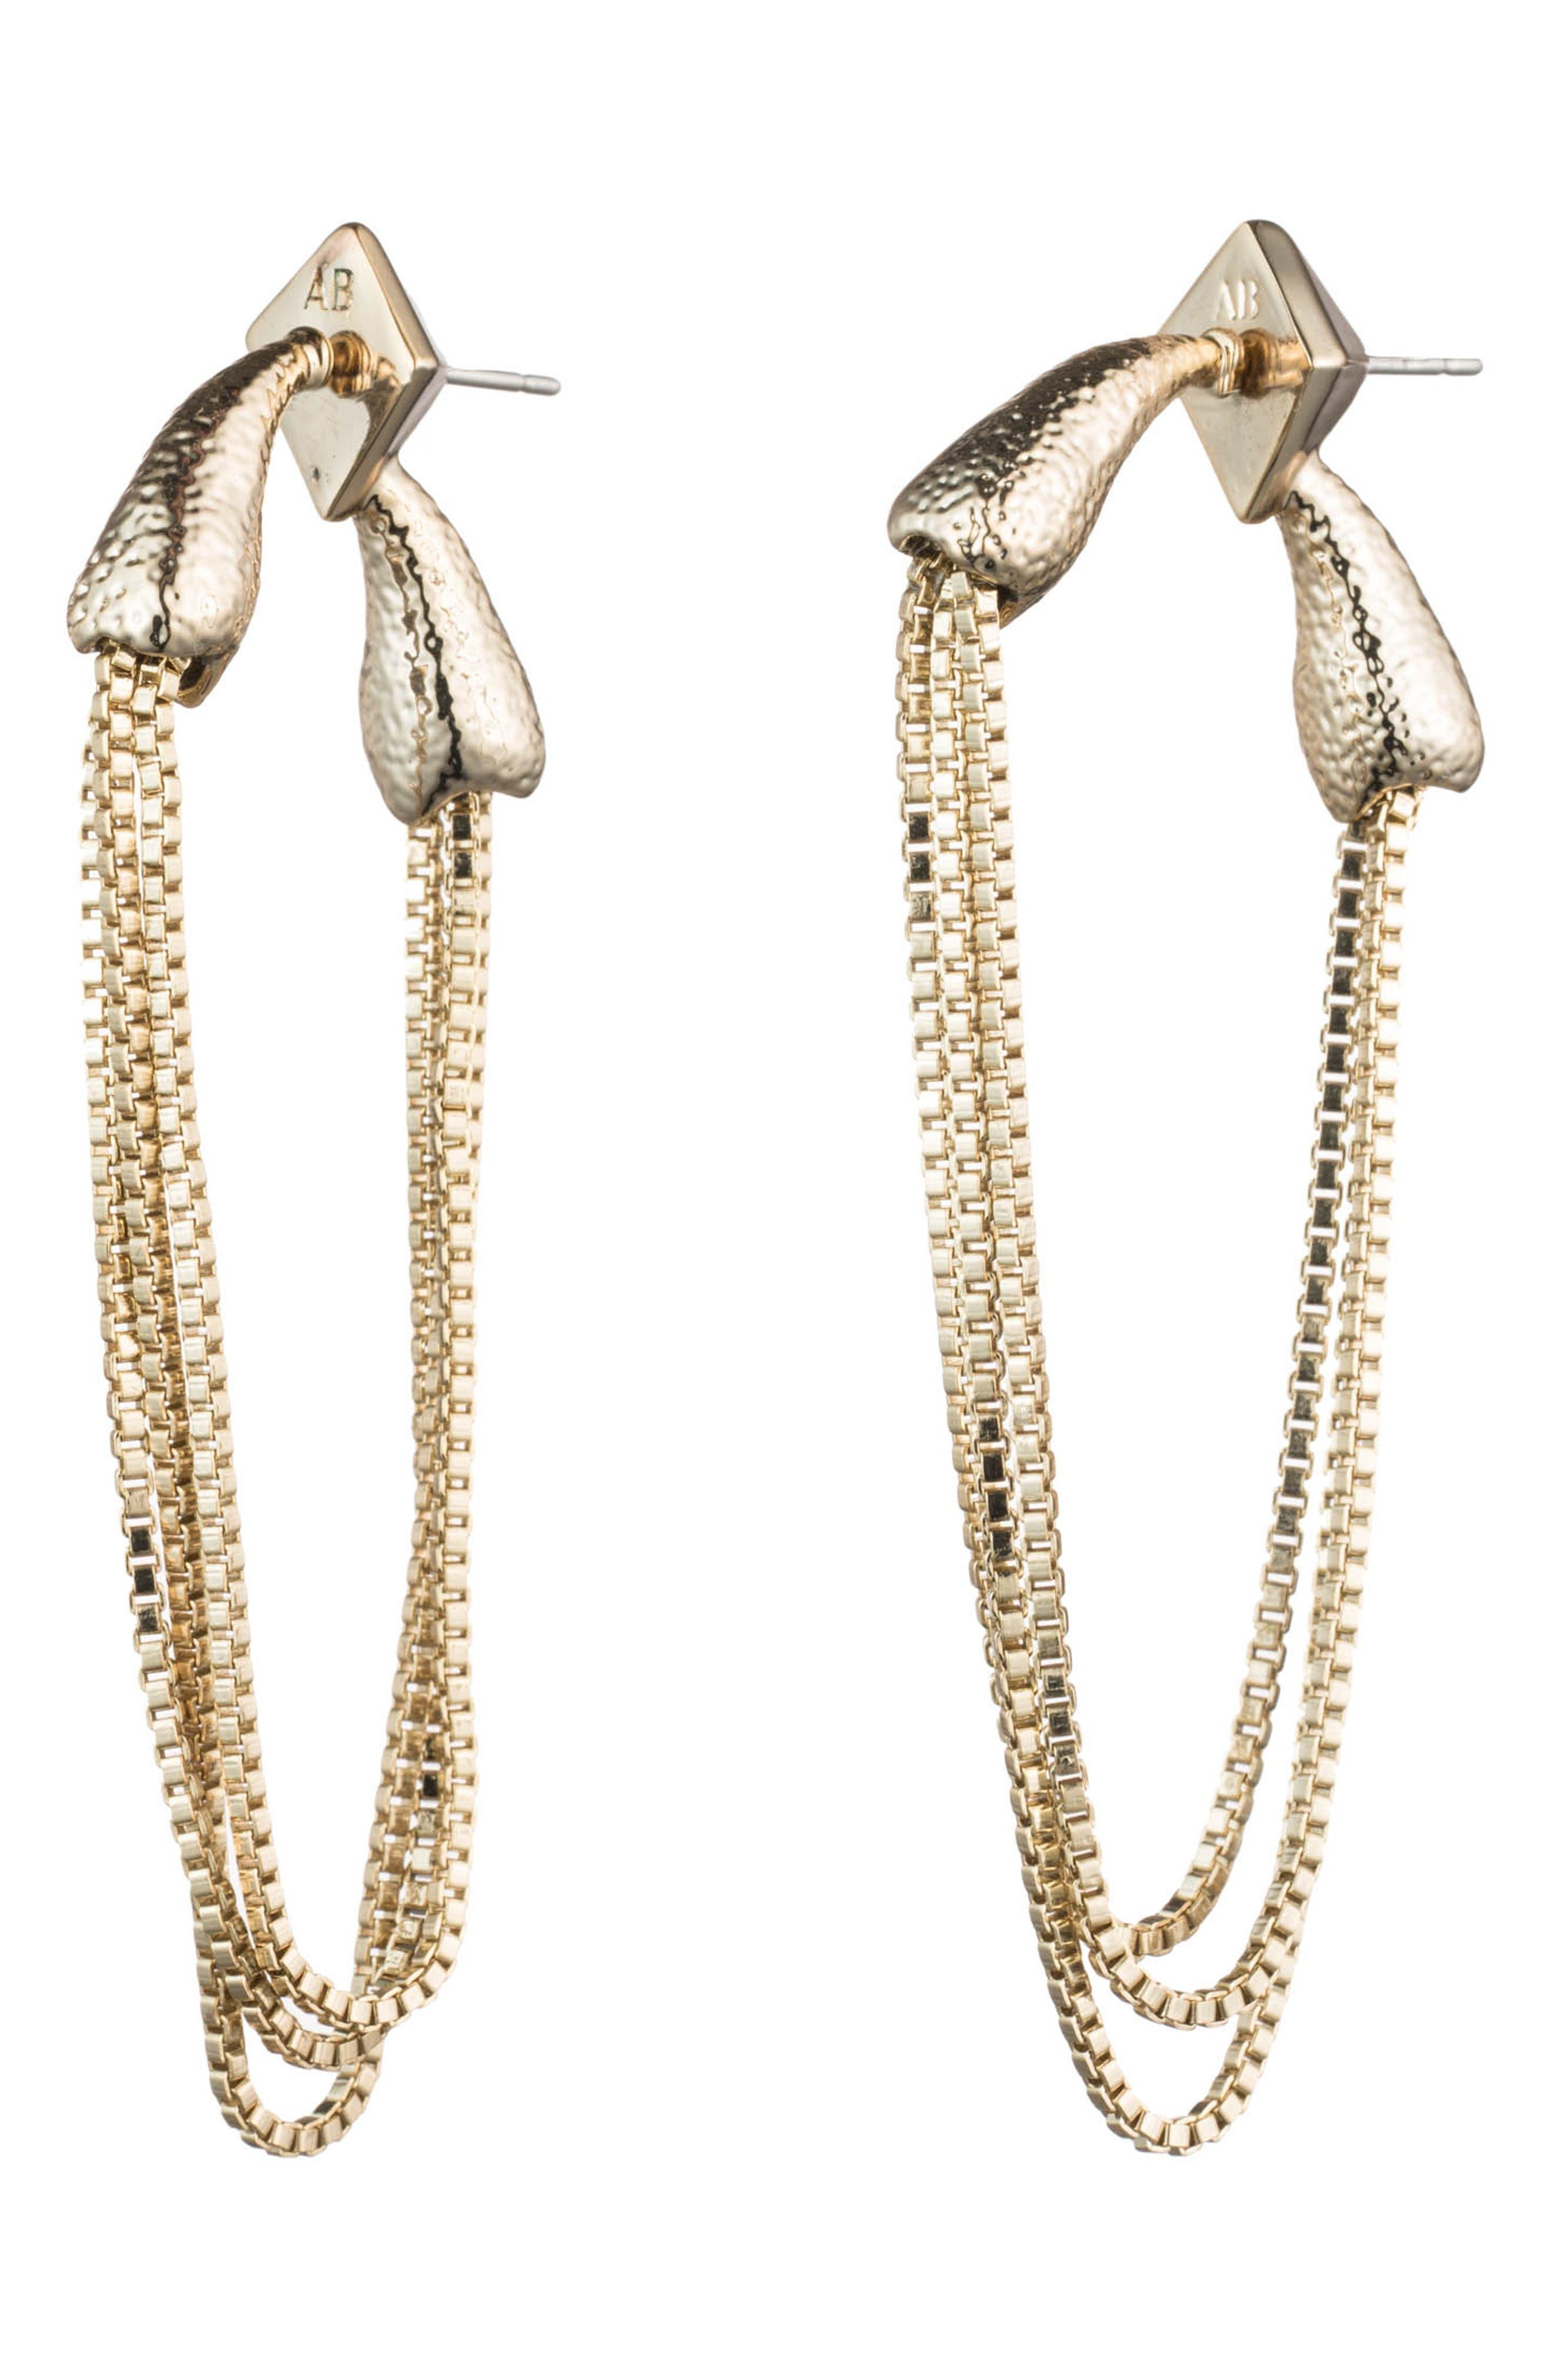 Snake Chain Earrings,                             Main thumbnail 1, color,                             10K GOLD